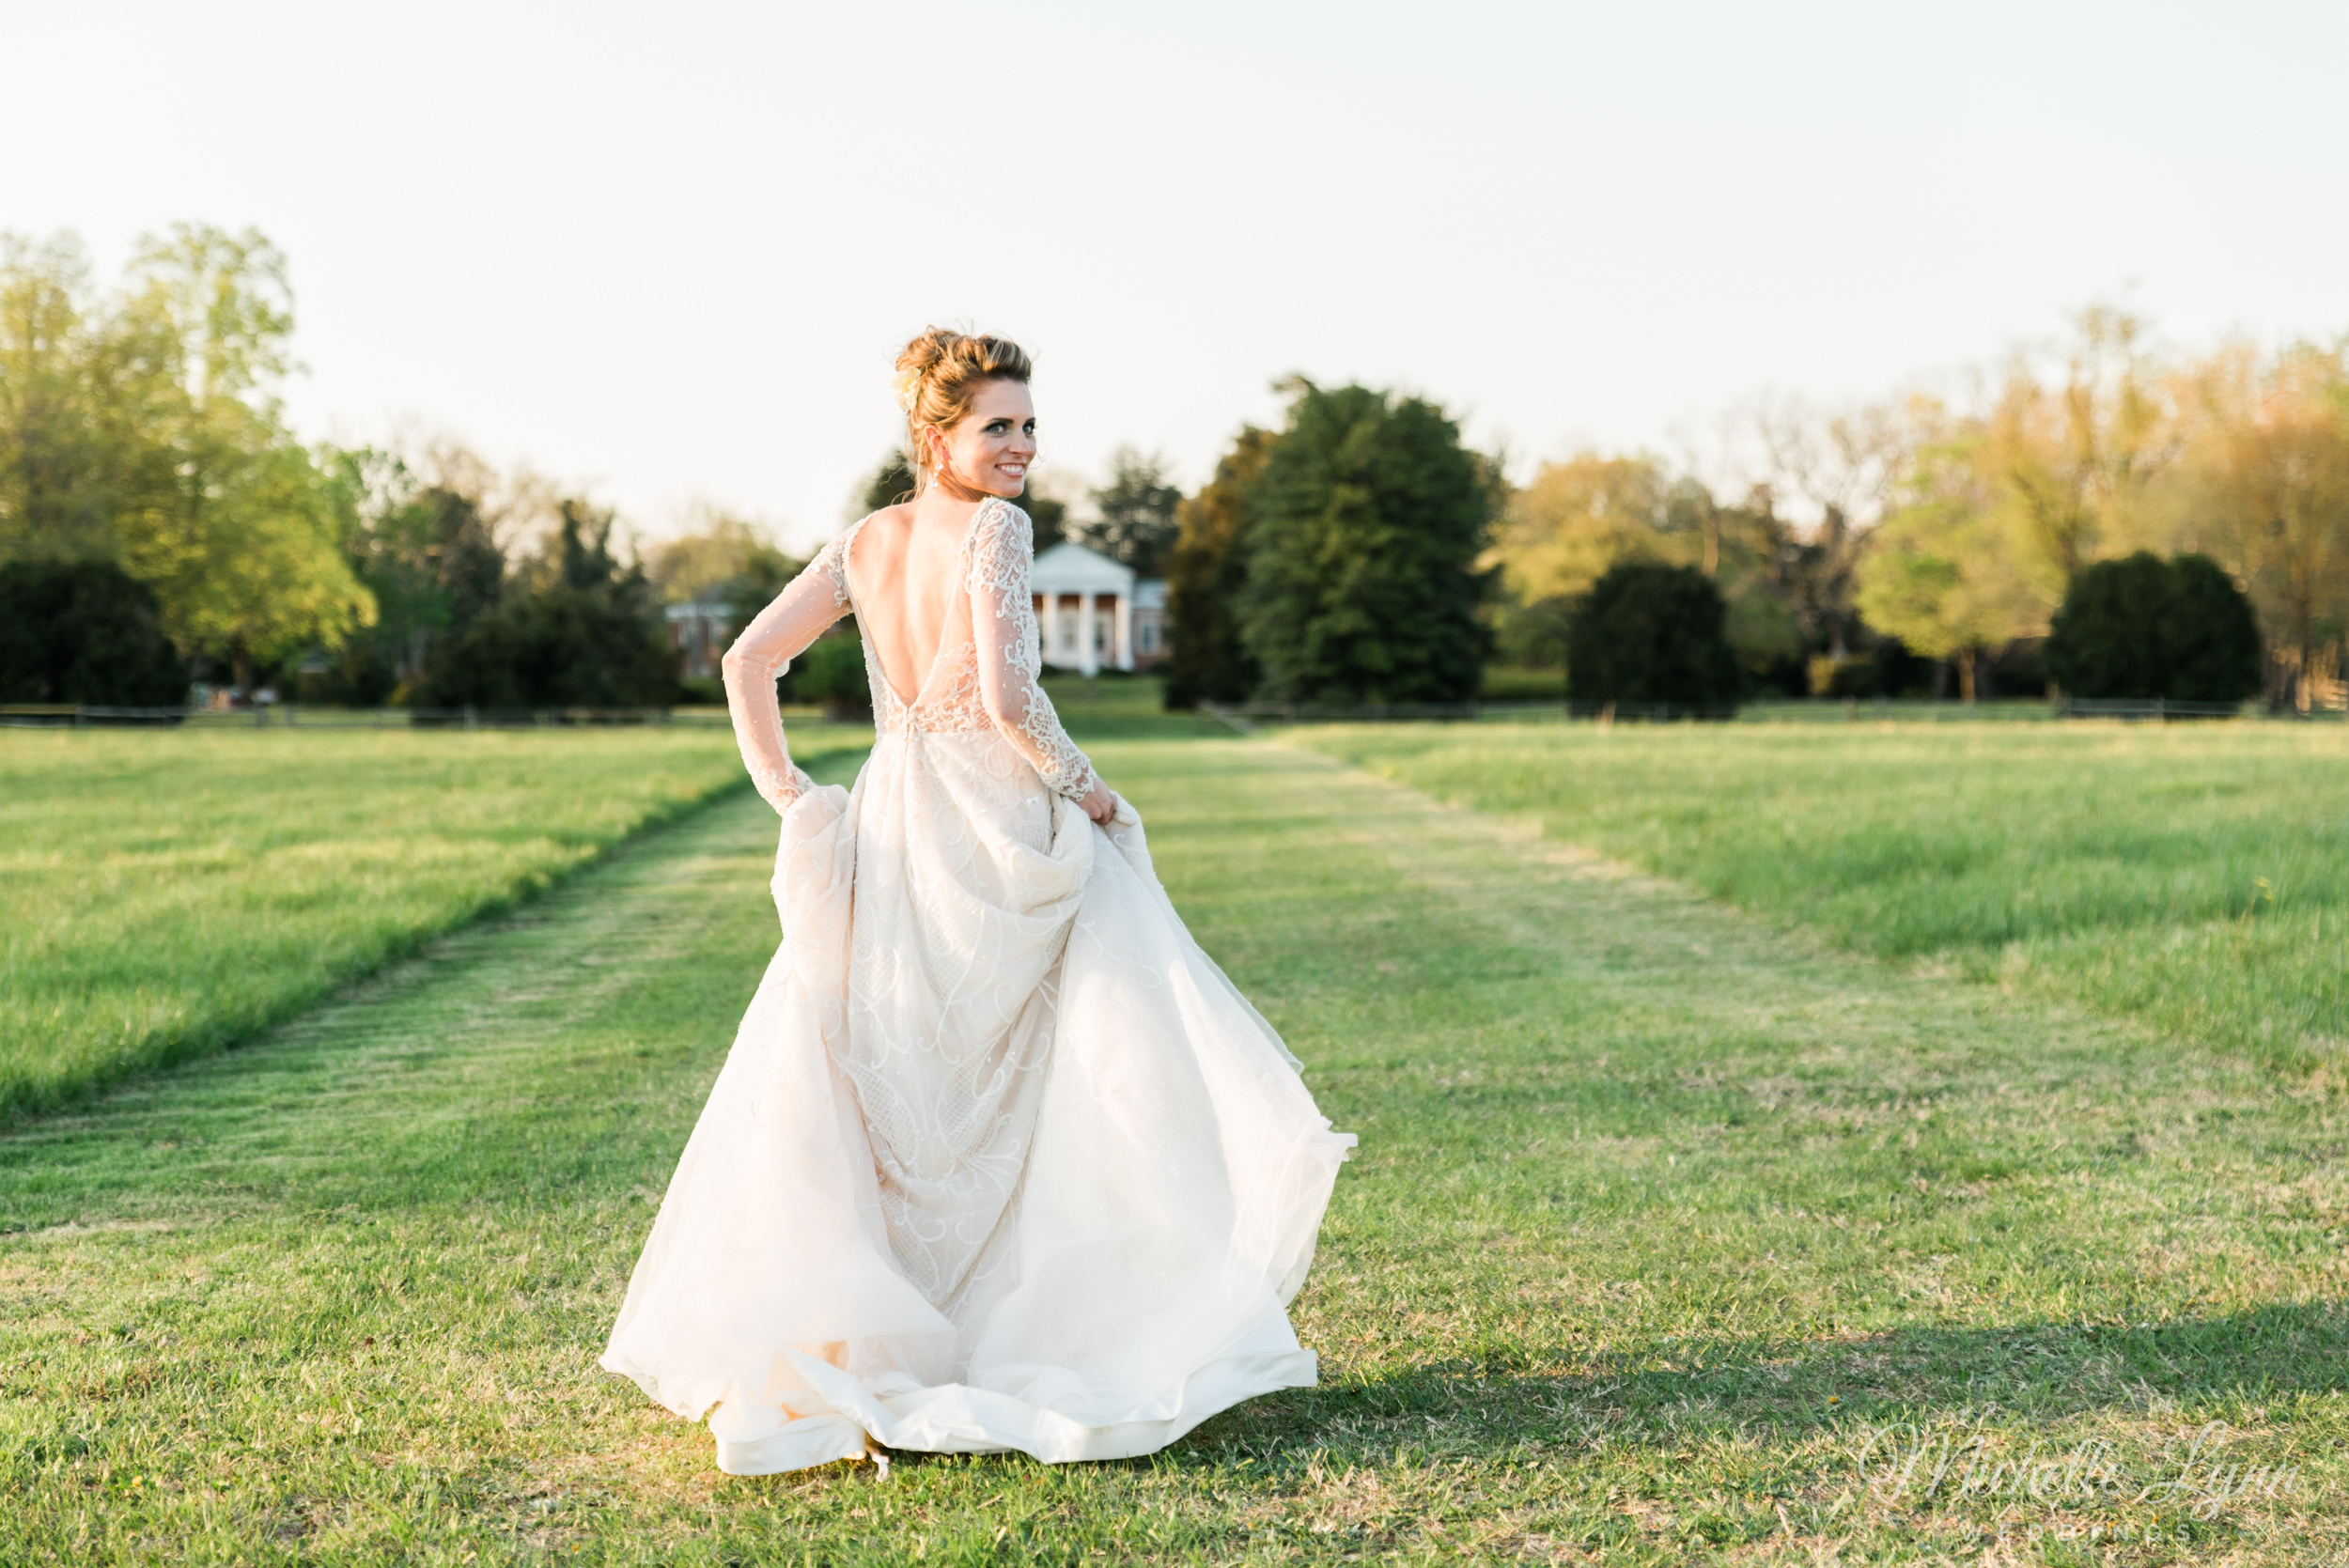 mlw-whitehall-annapolis-wedding-photography-17.jpg